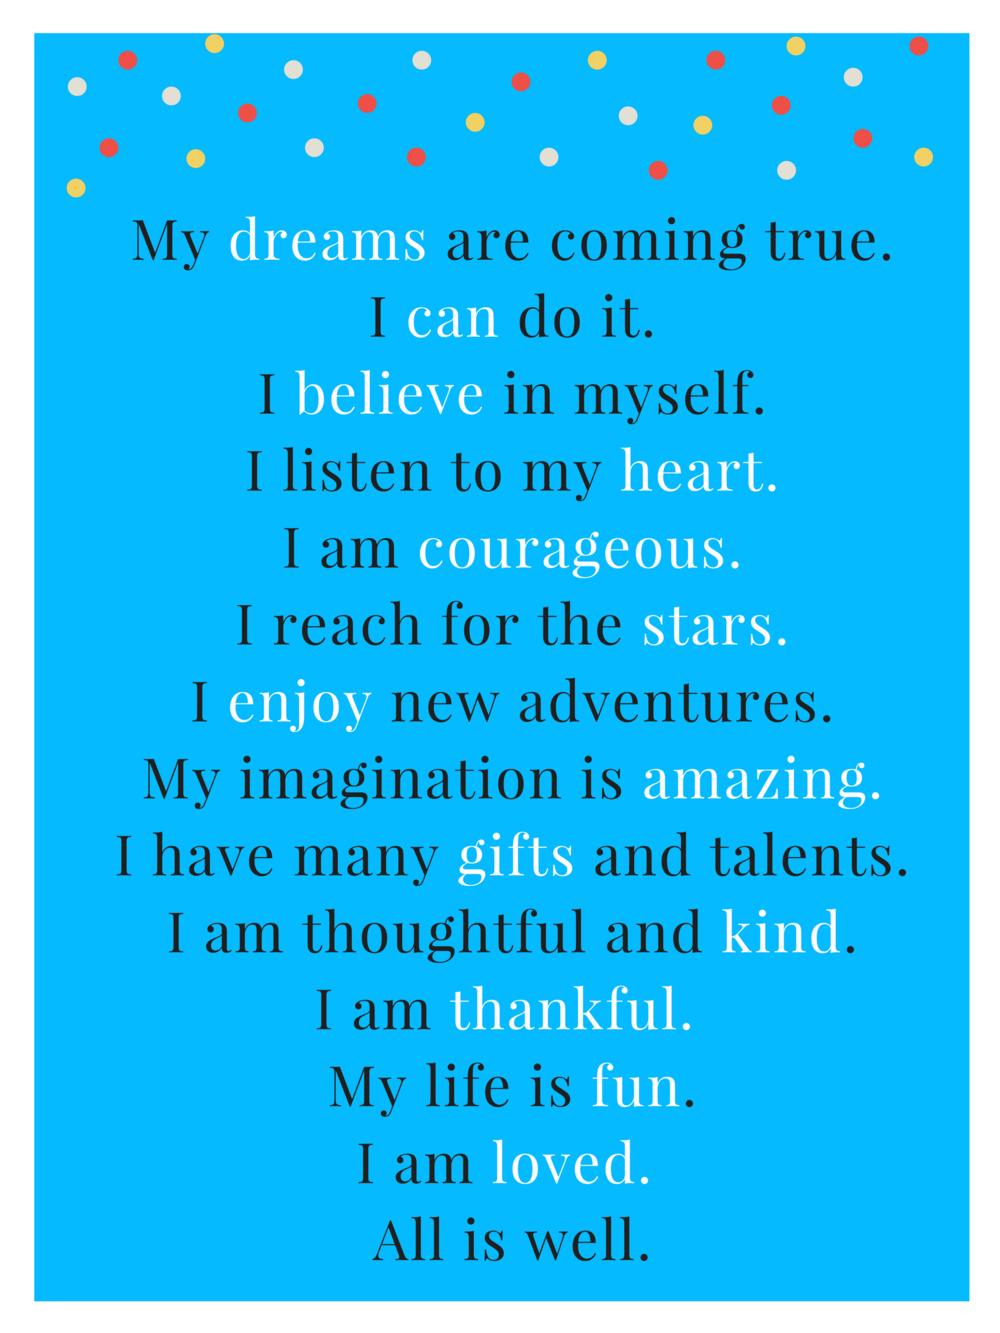 Affirmations for Children.png